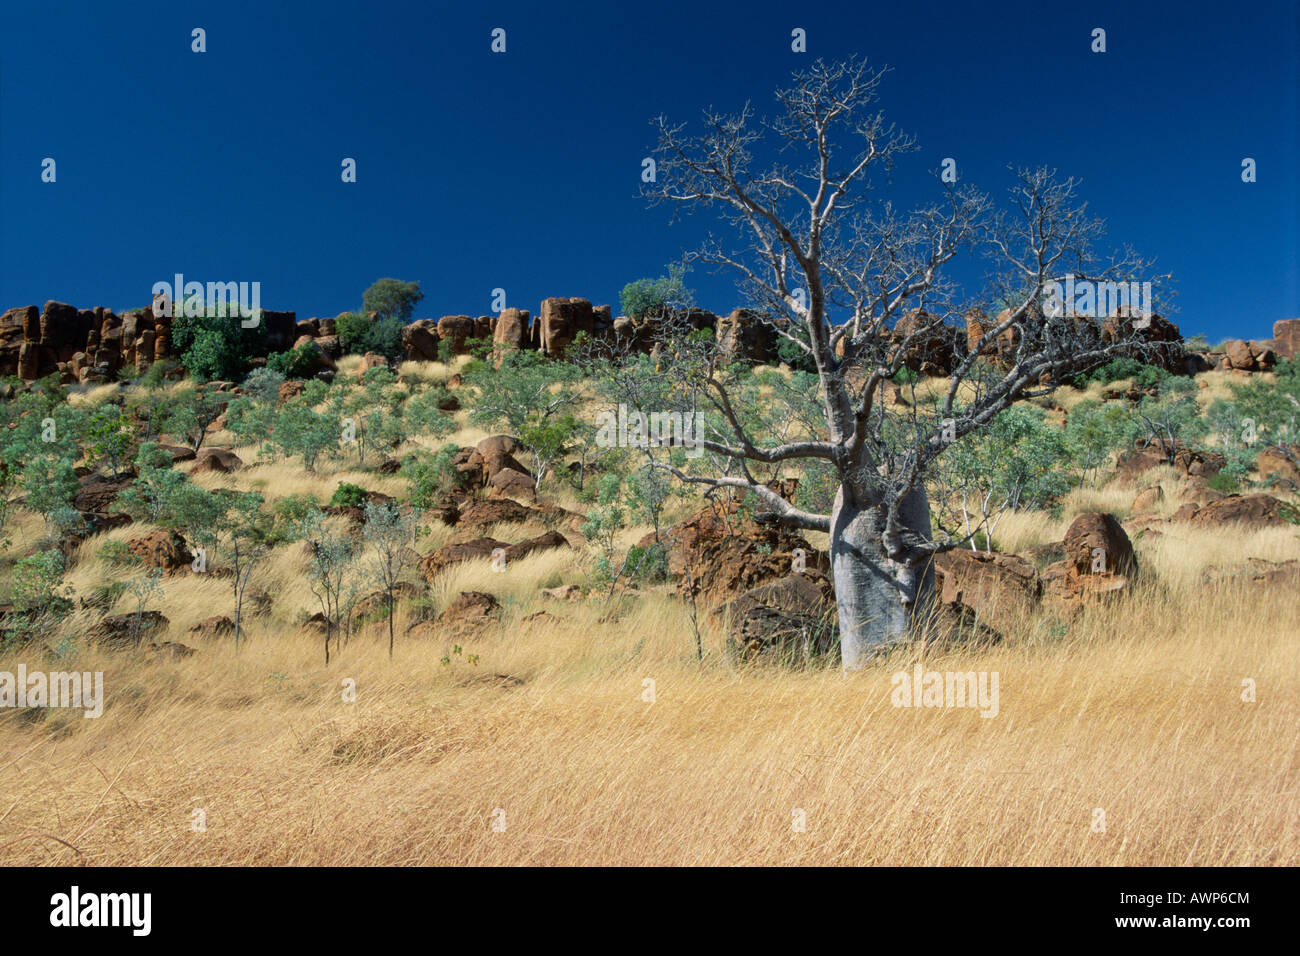 Baobab tree (Adansonia gregorii), Kimberly Region, Western Australia, Australia, Oceania Stock Photo